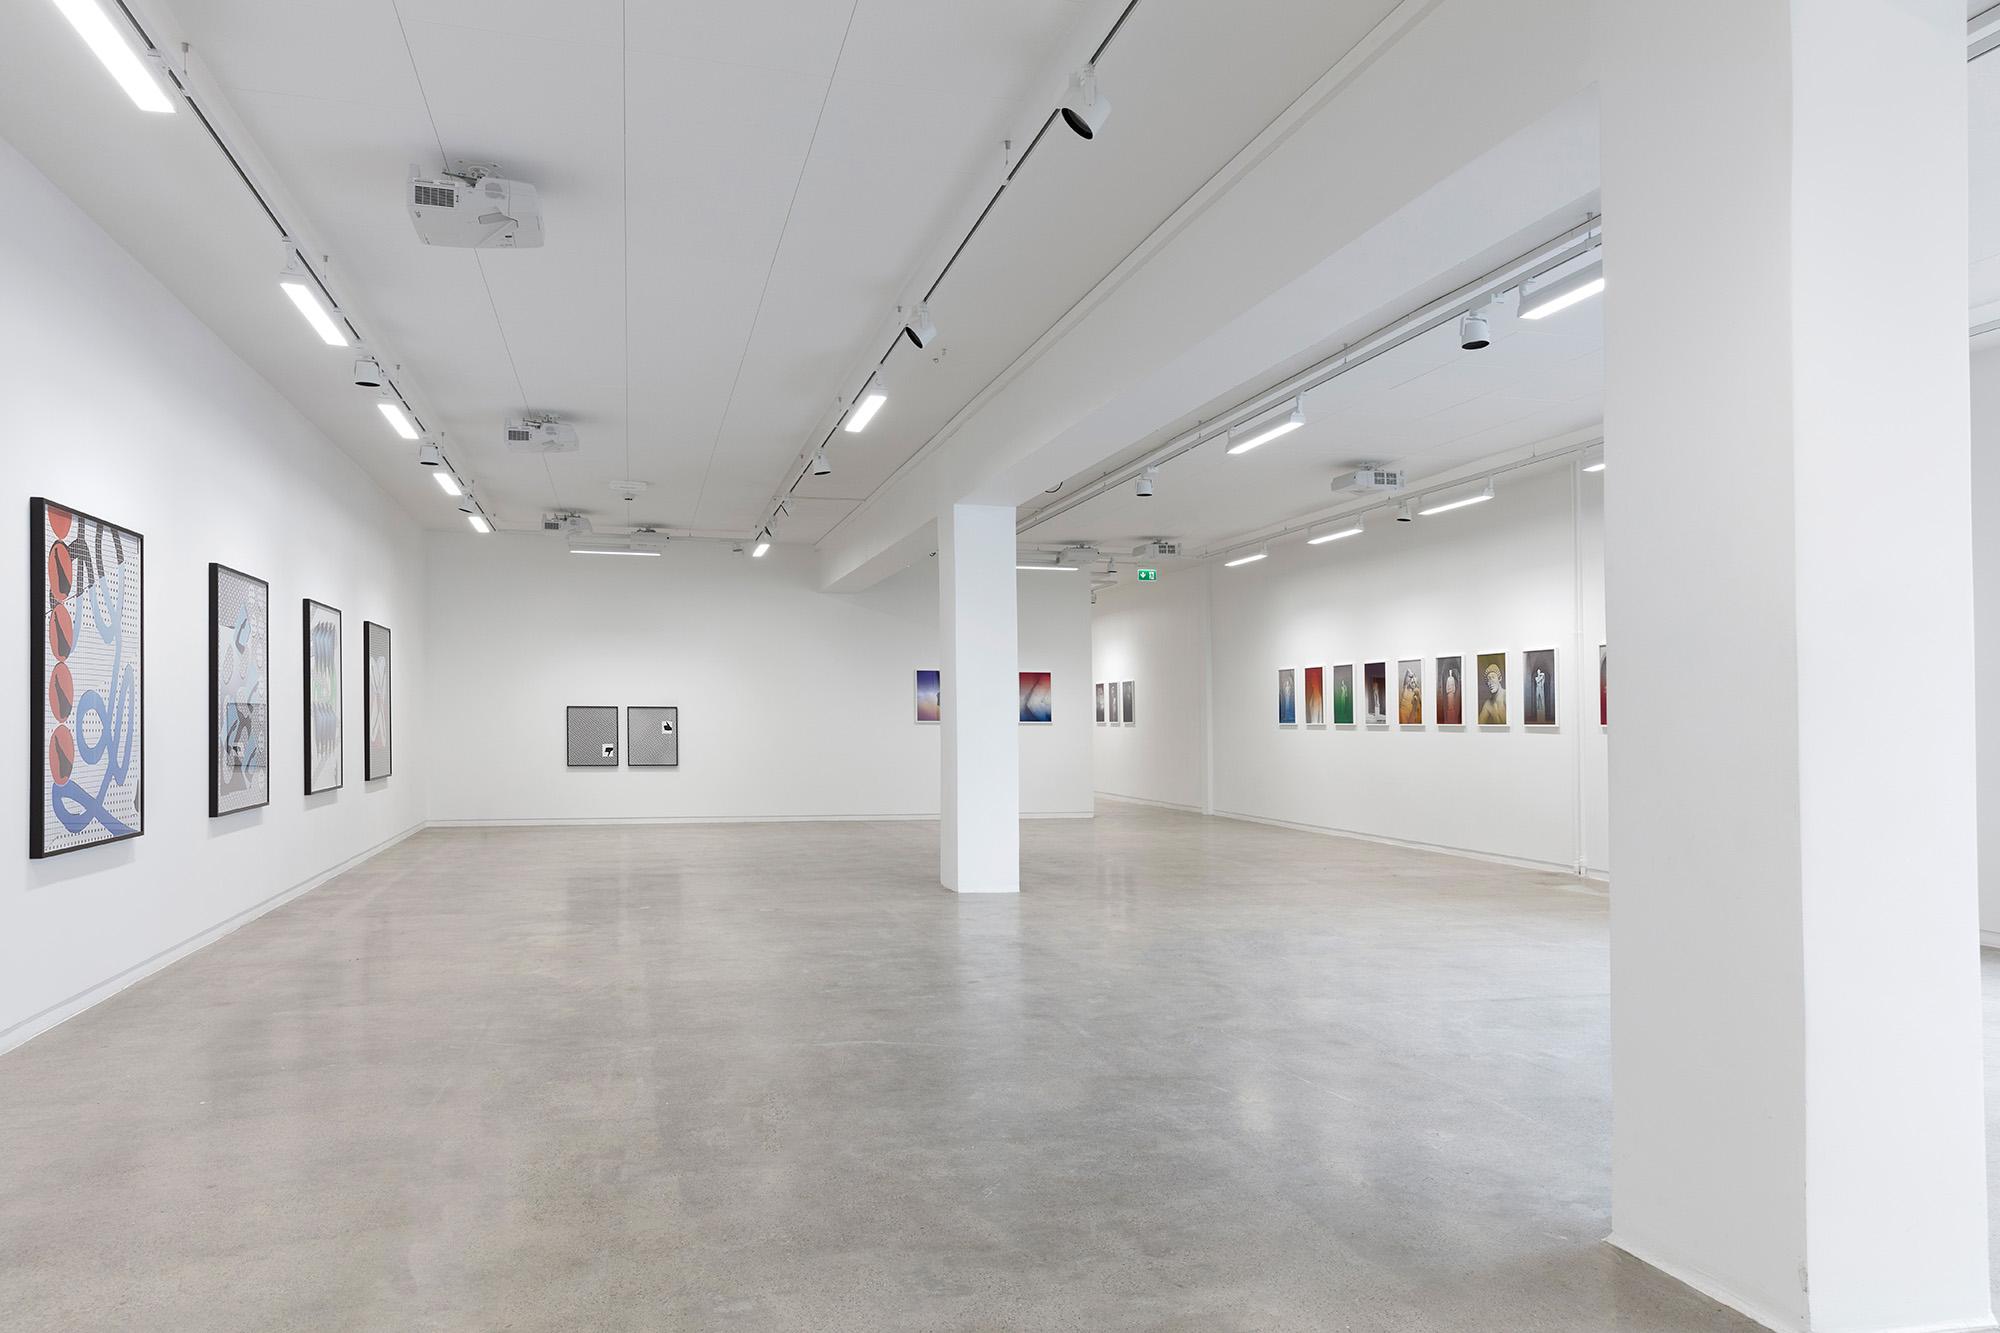 Installation view of MILKSHAKE #3 at Golsa, curated by MELK 2018